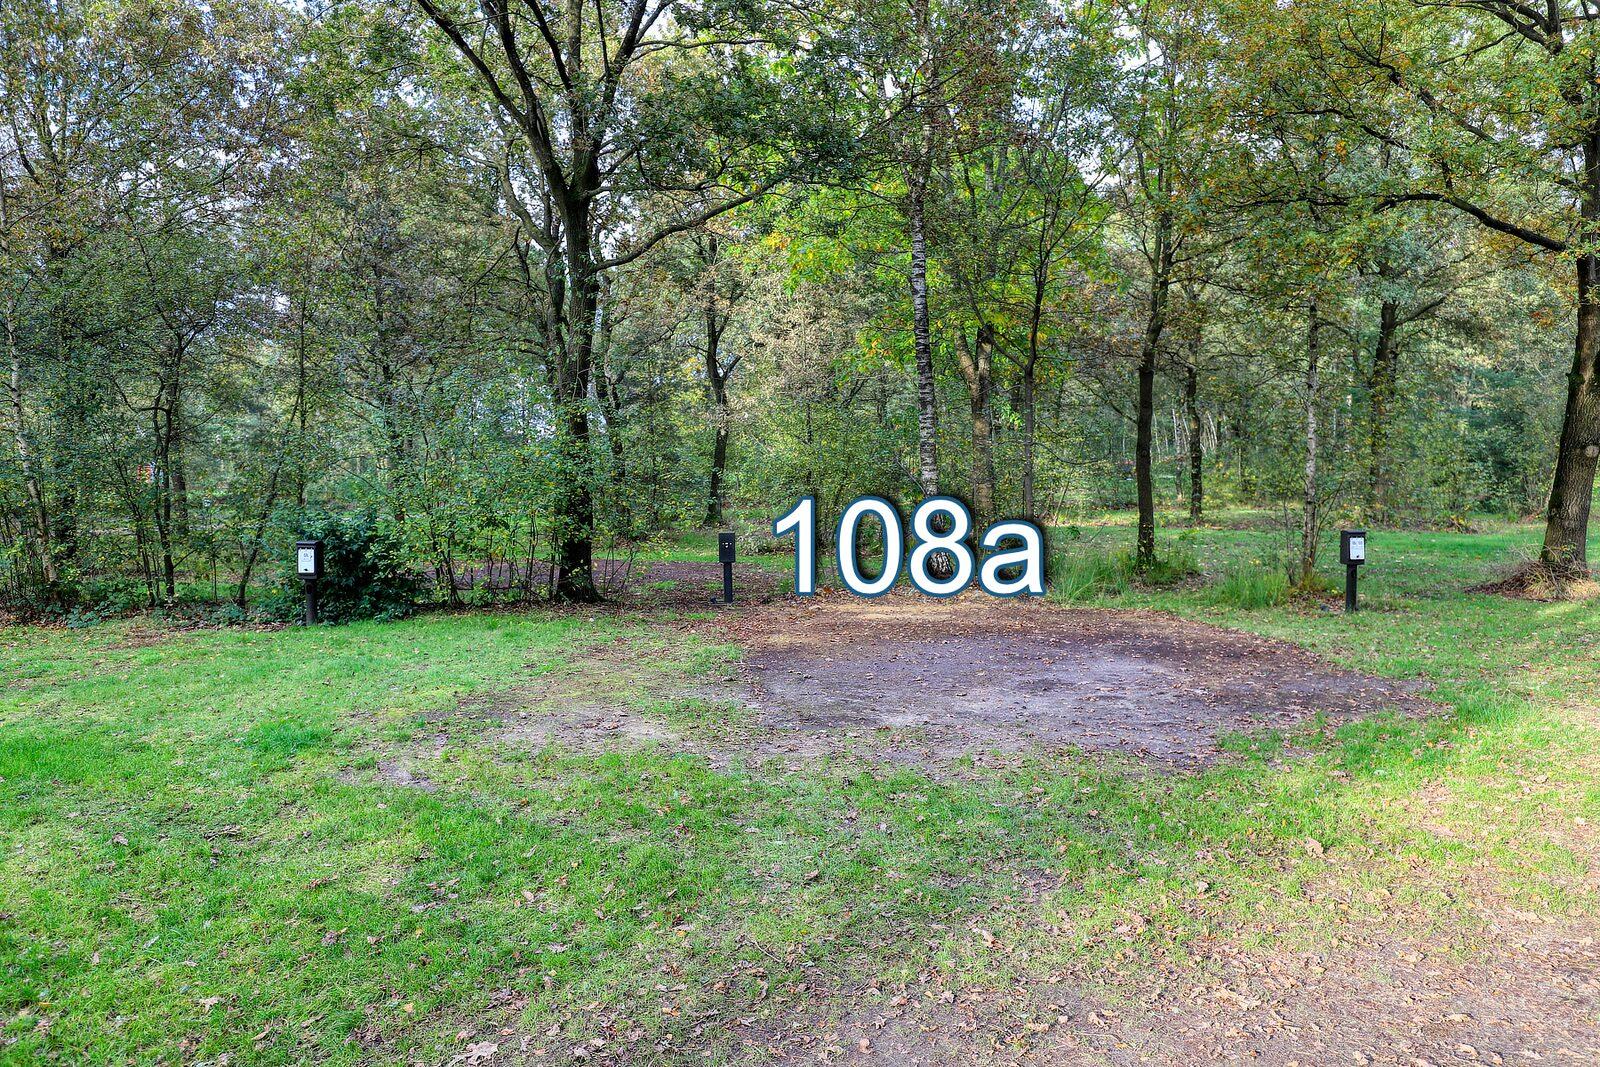 boshoek 108a